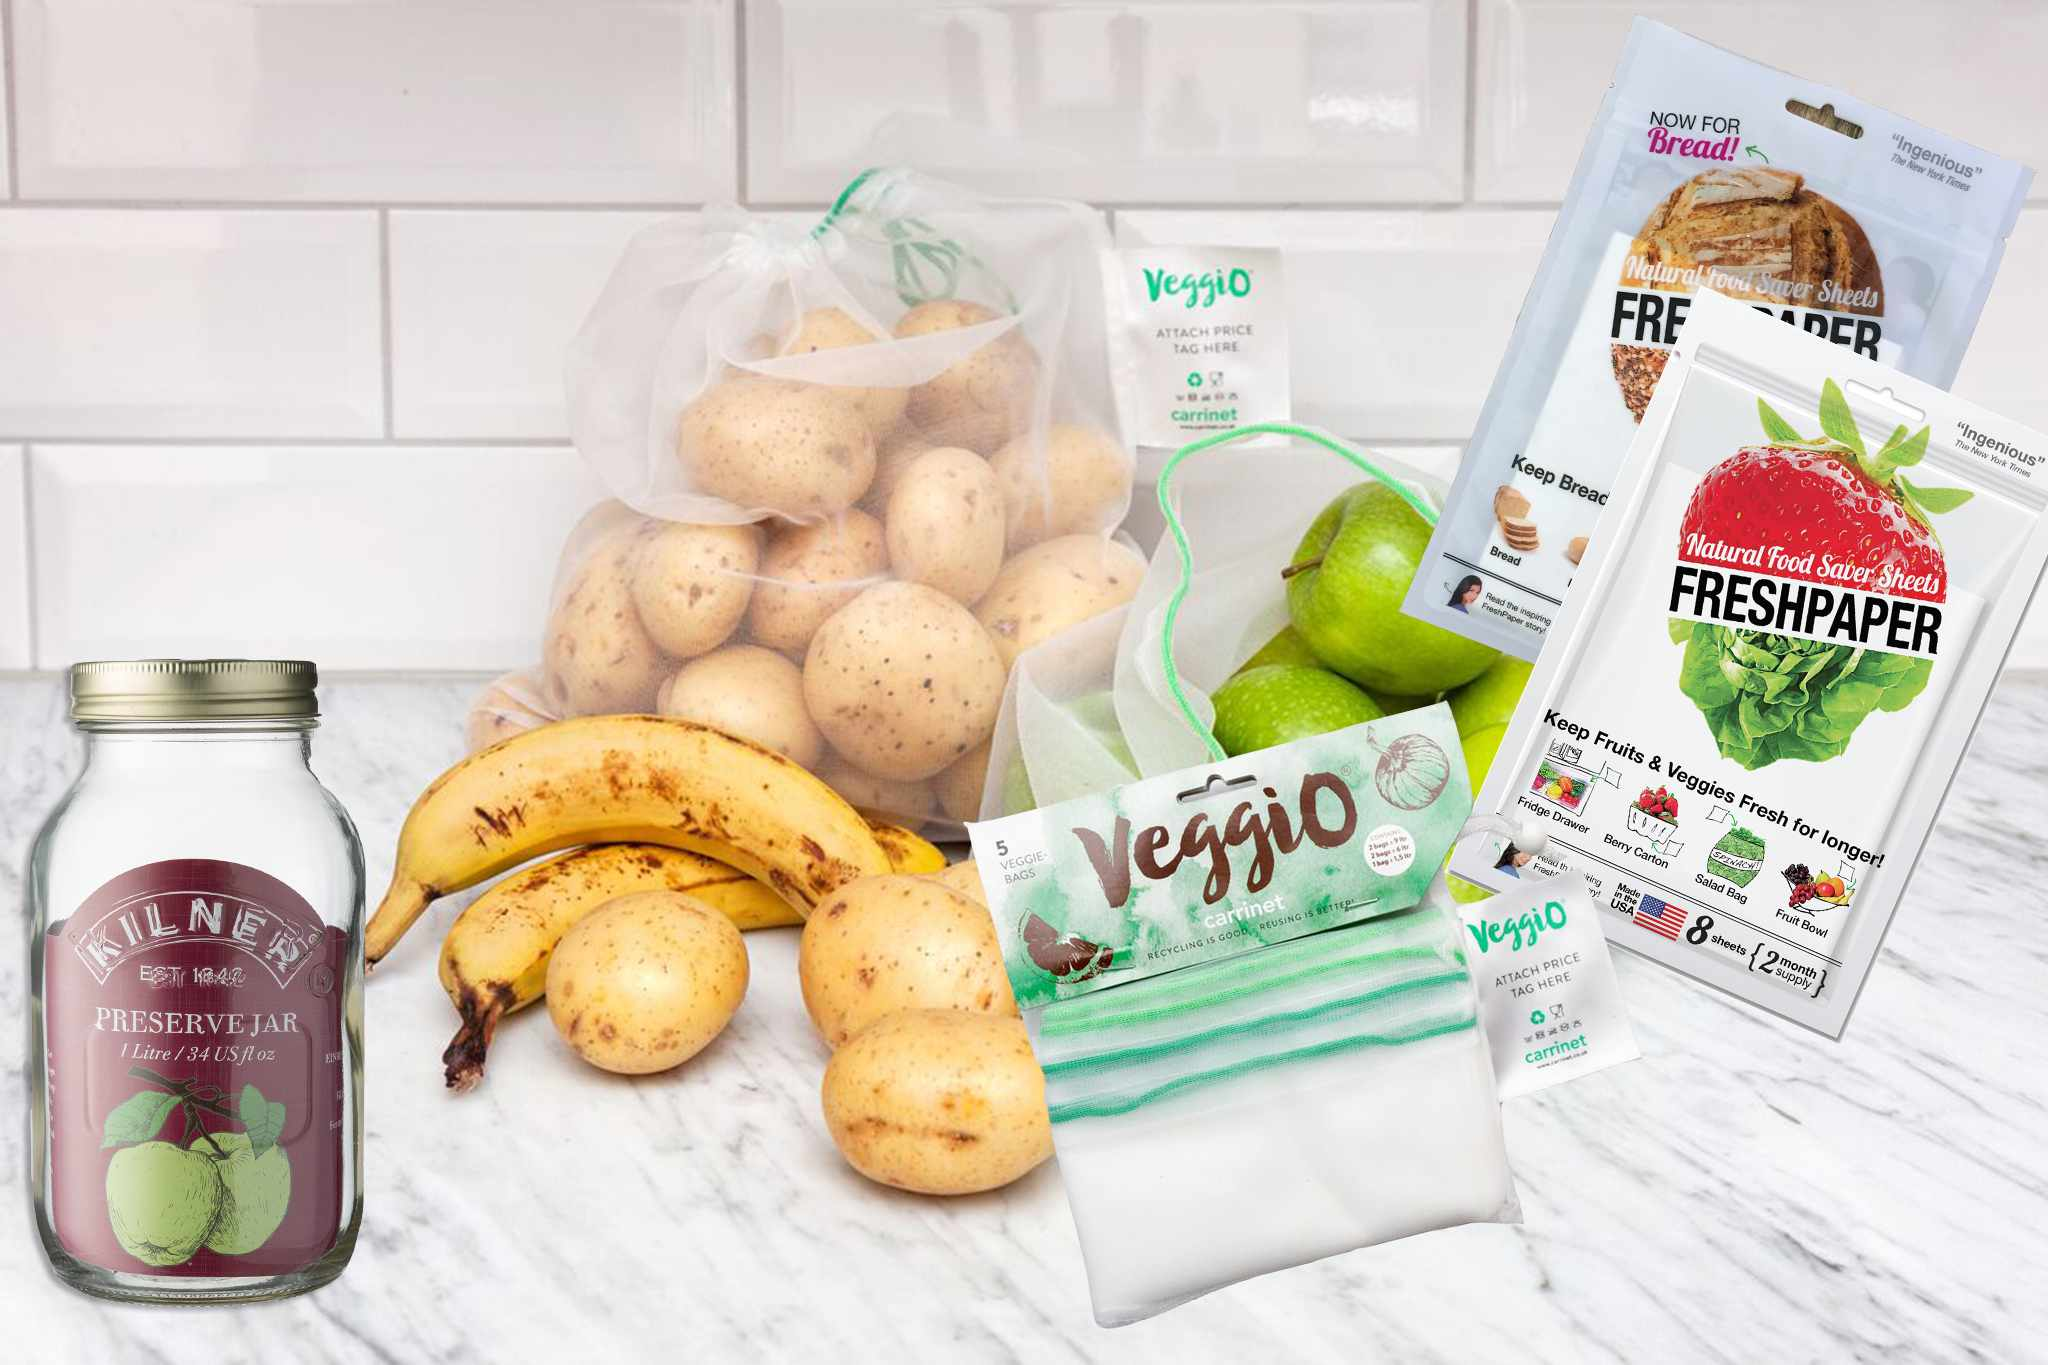 2tech-free-postage-veg-fruit-nets_2-2048-1365